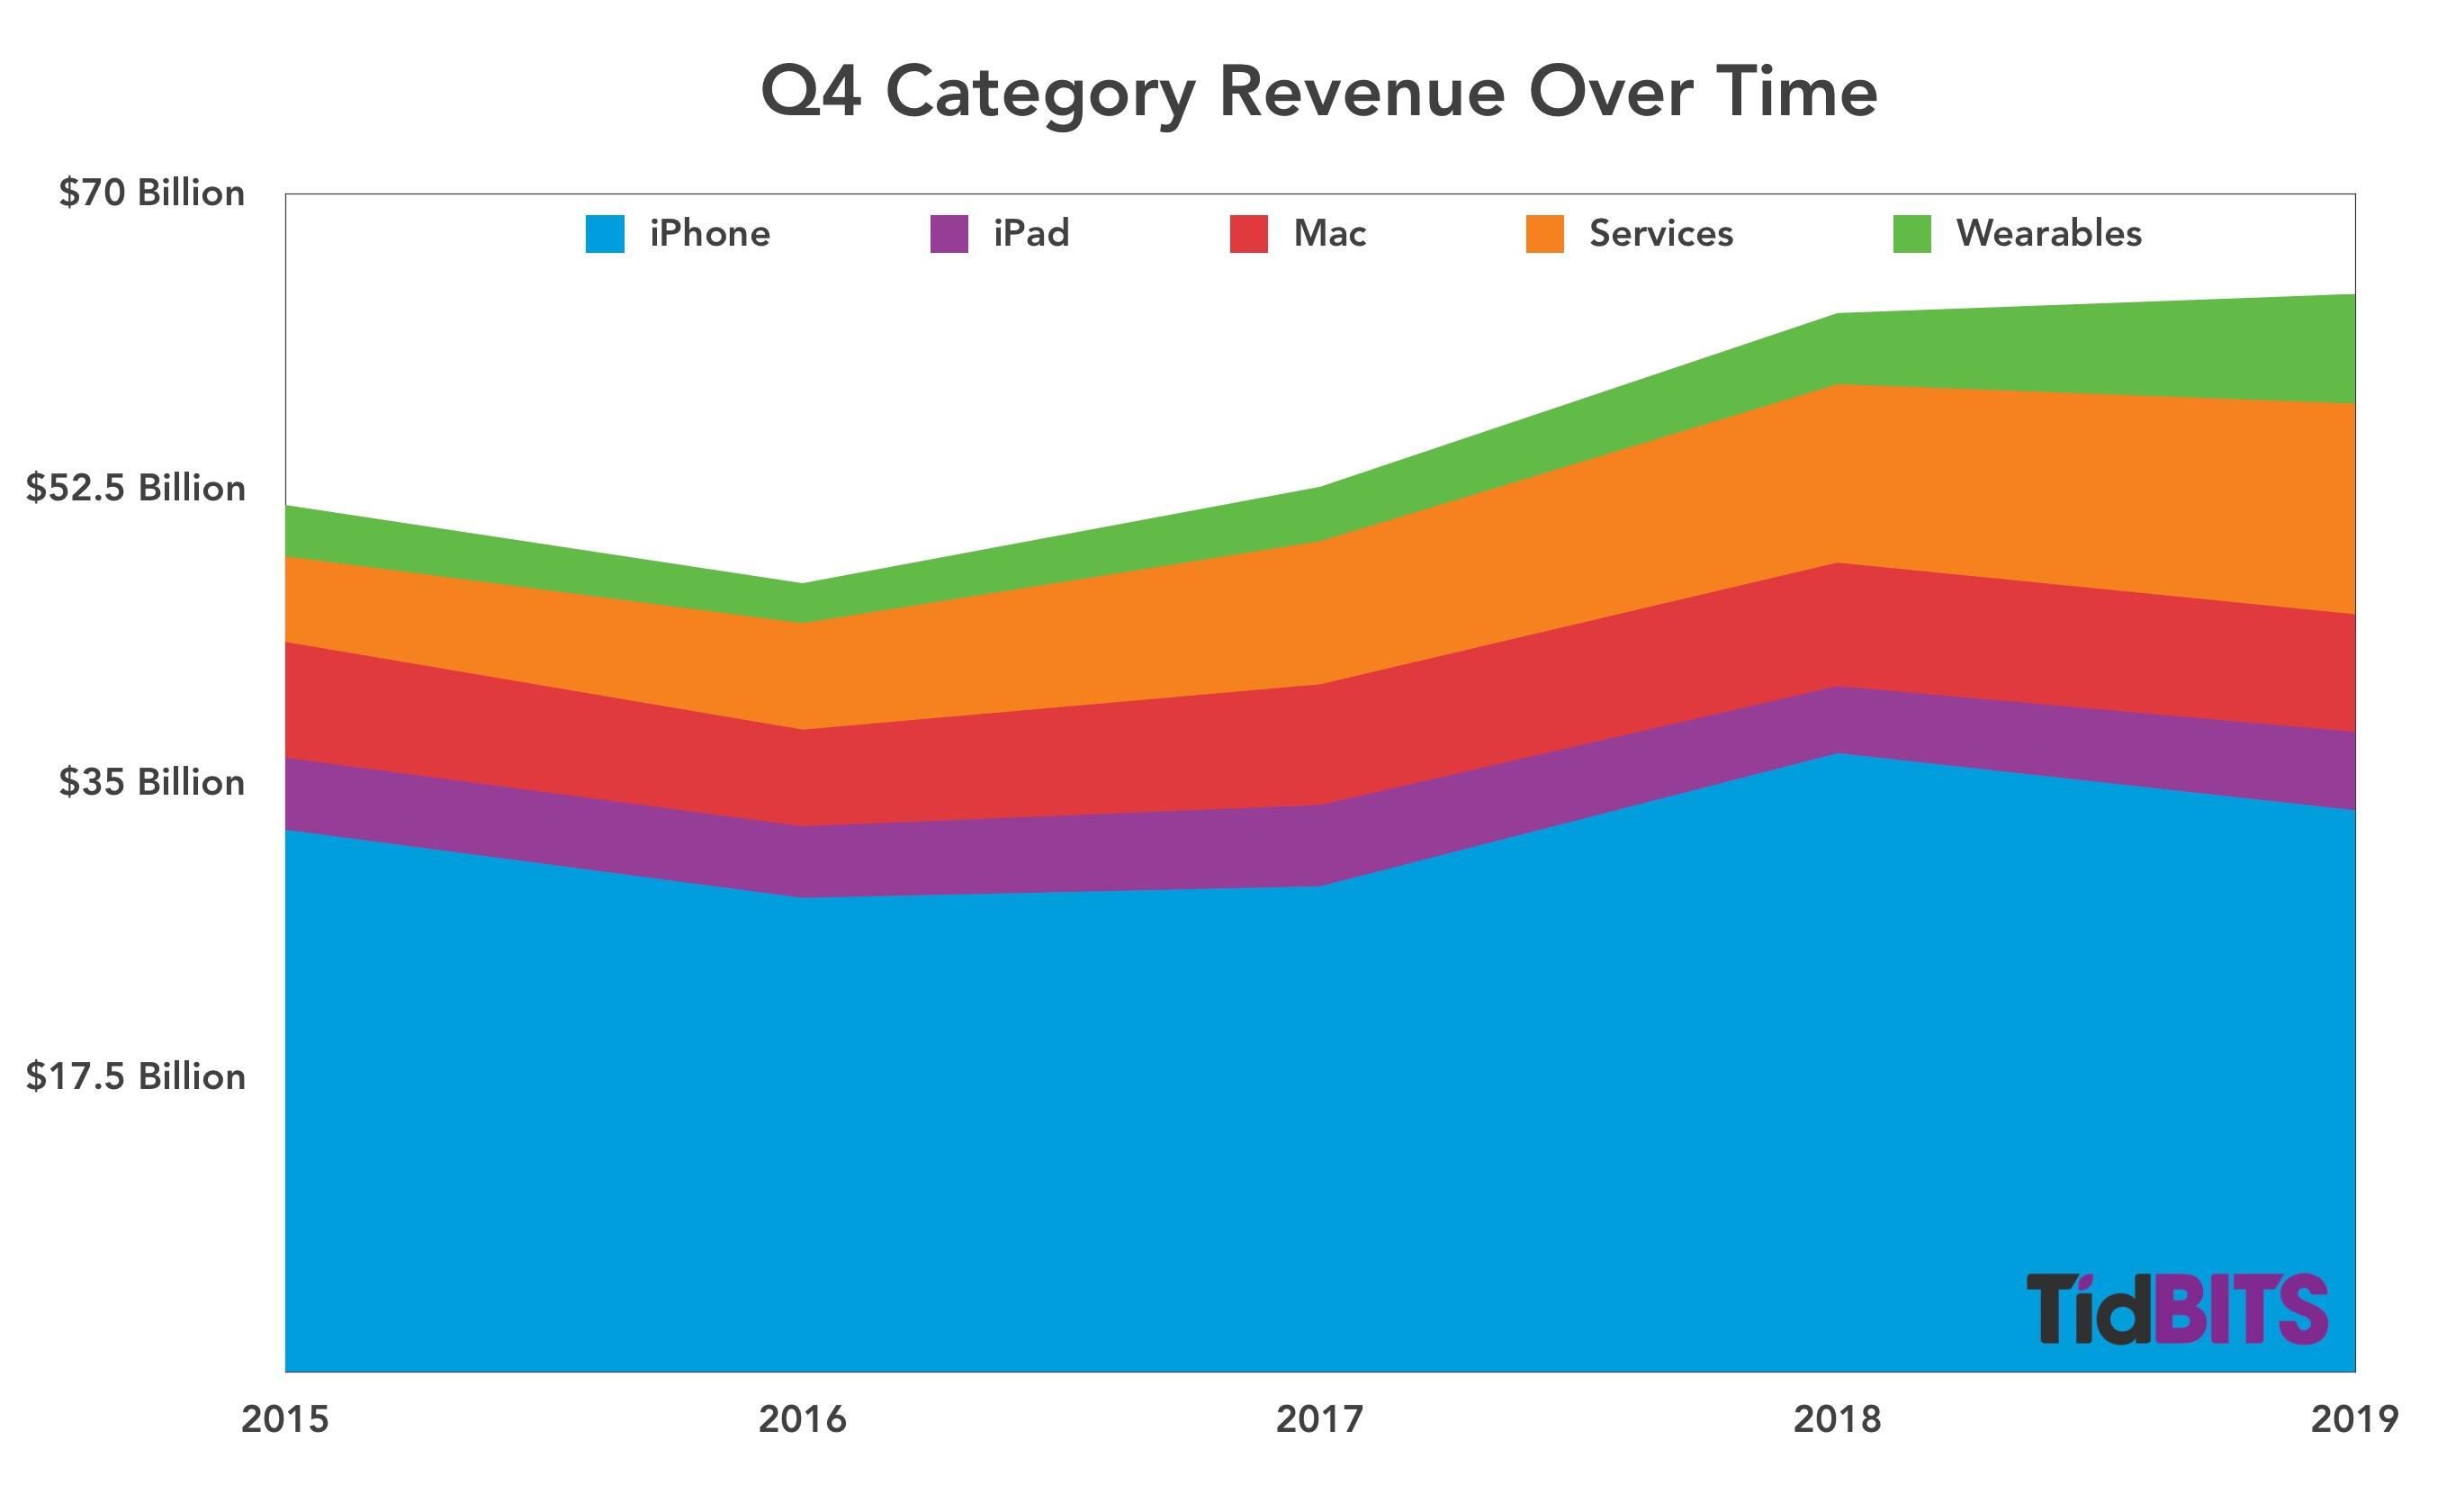 Apple Q4 revenue over time